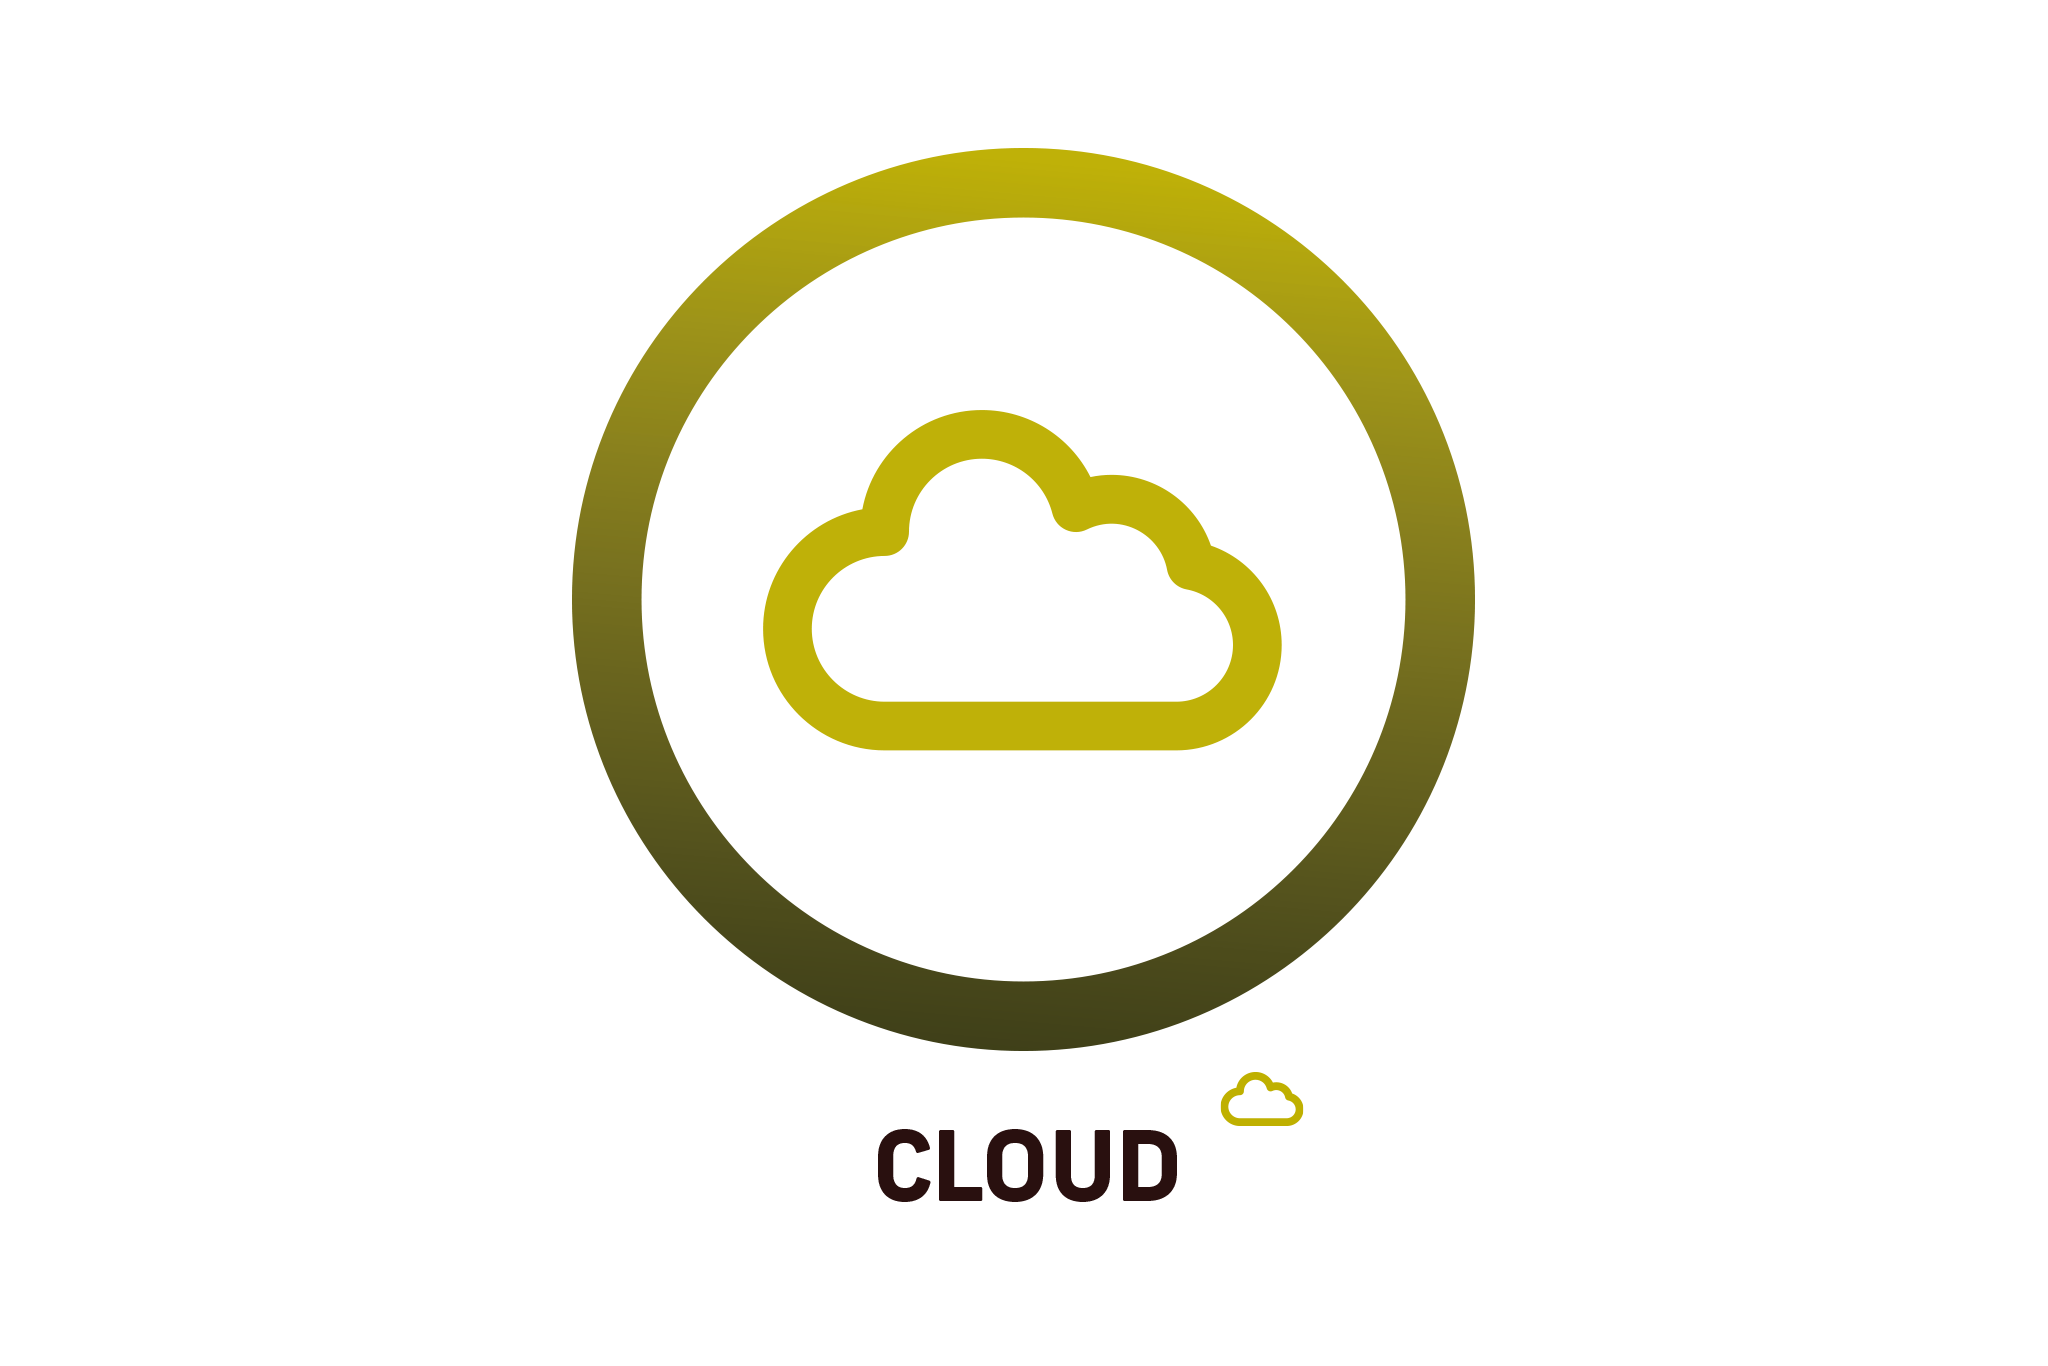 https://immotooler.com/wp-content/uploads/2021/04/cloud-portfolio.png